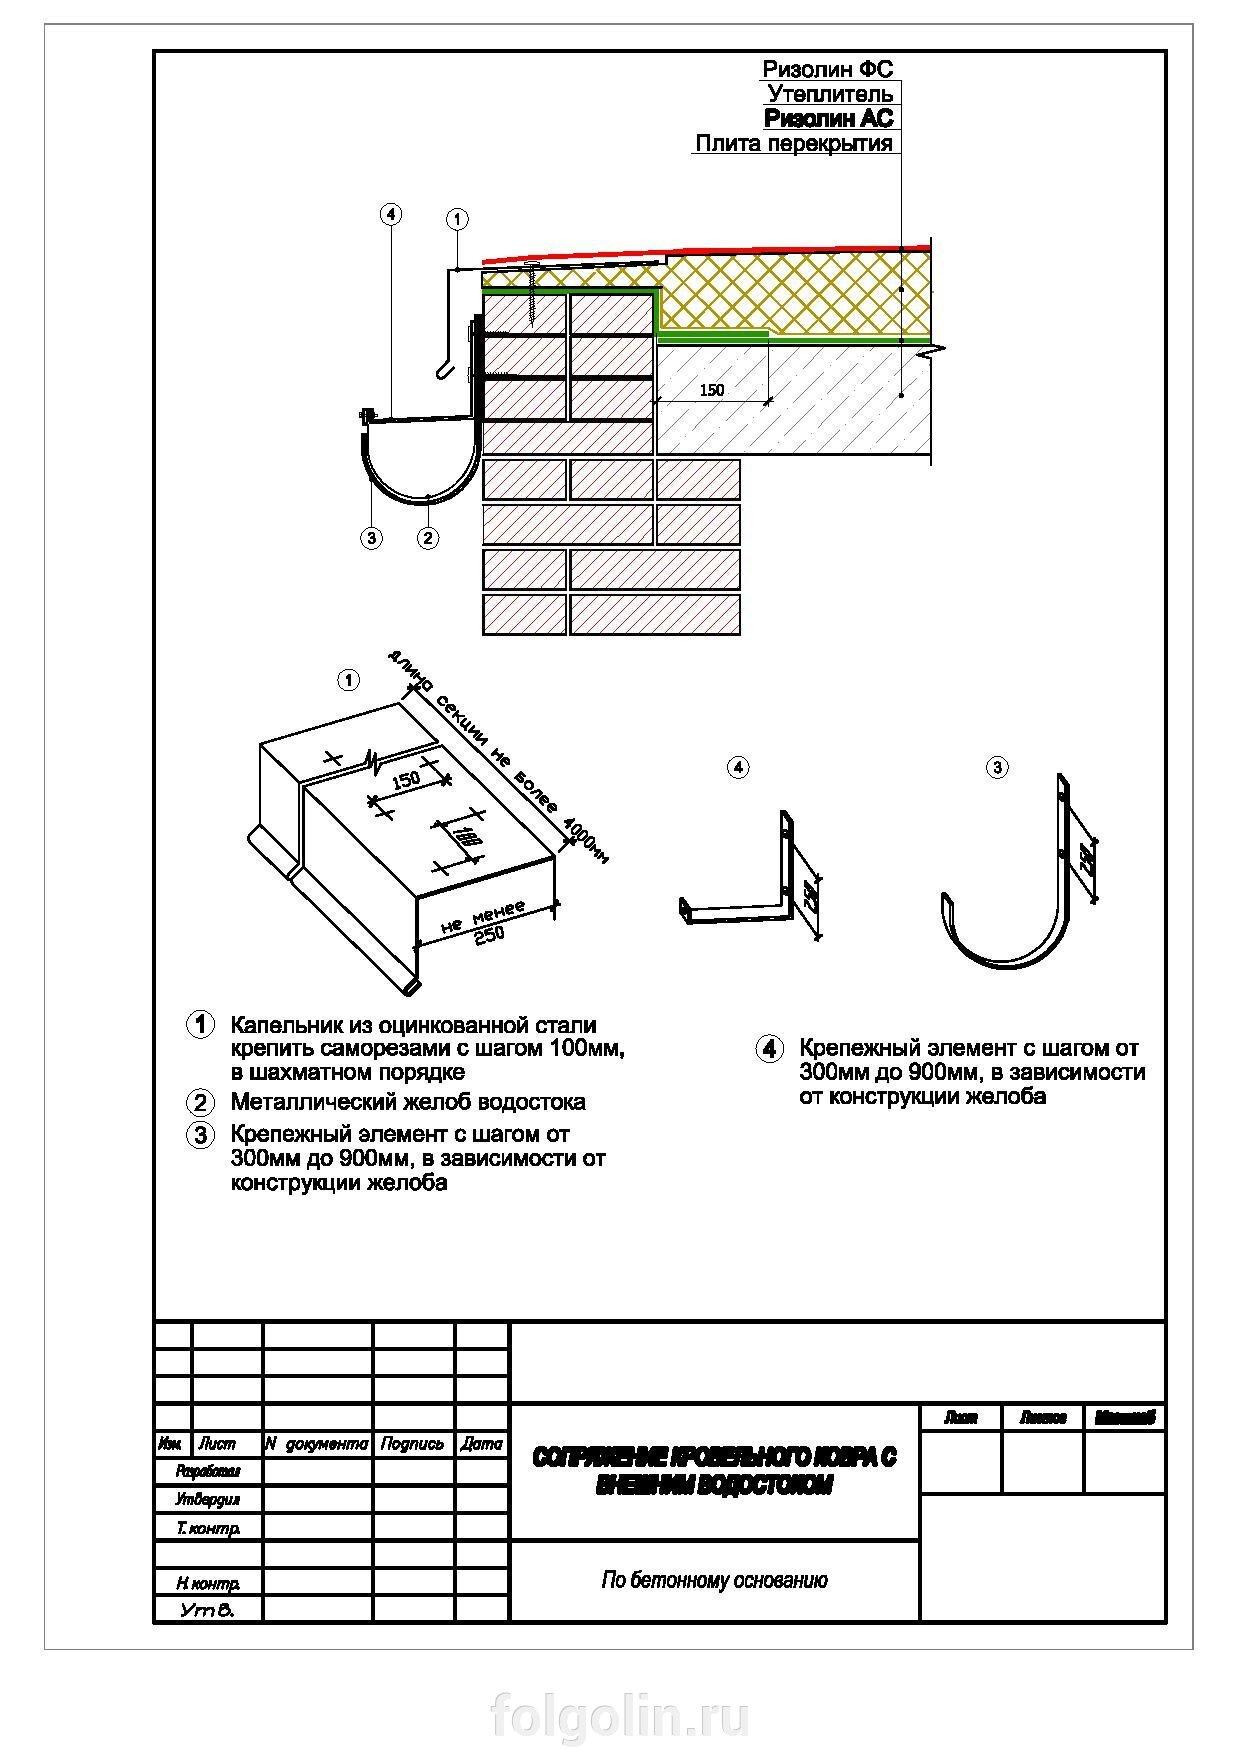 Сопряжение с внешним водостоком - фото pic_2f297c39974613f97df114c6ae9ddcc0_1920x9000_1.jpg